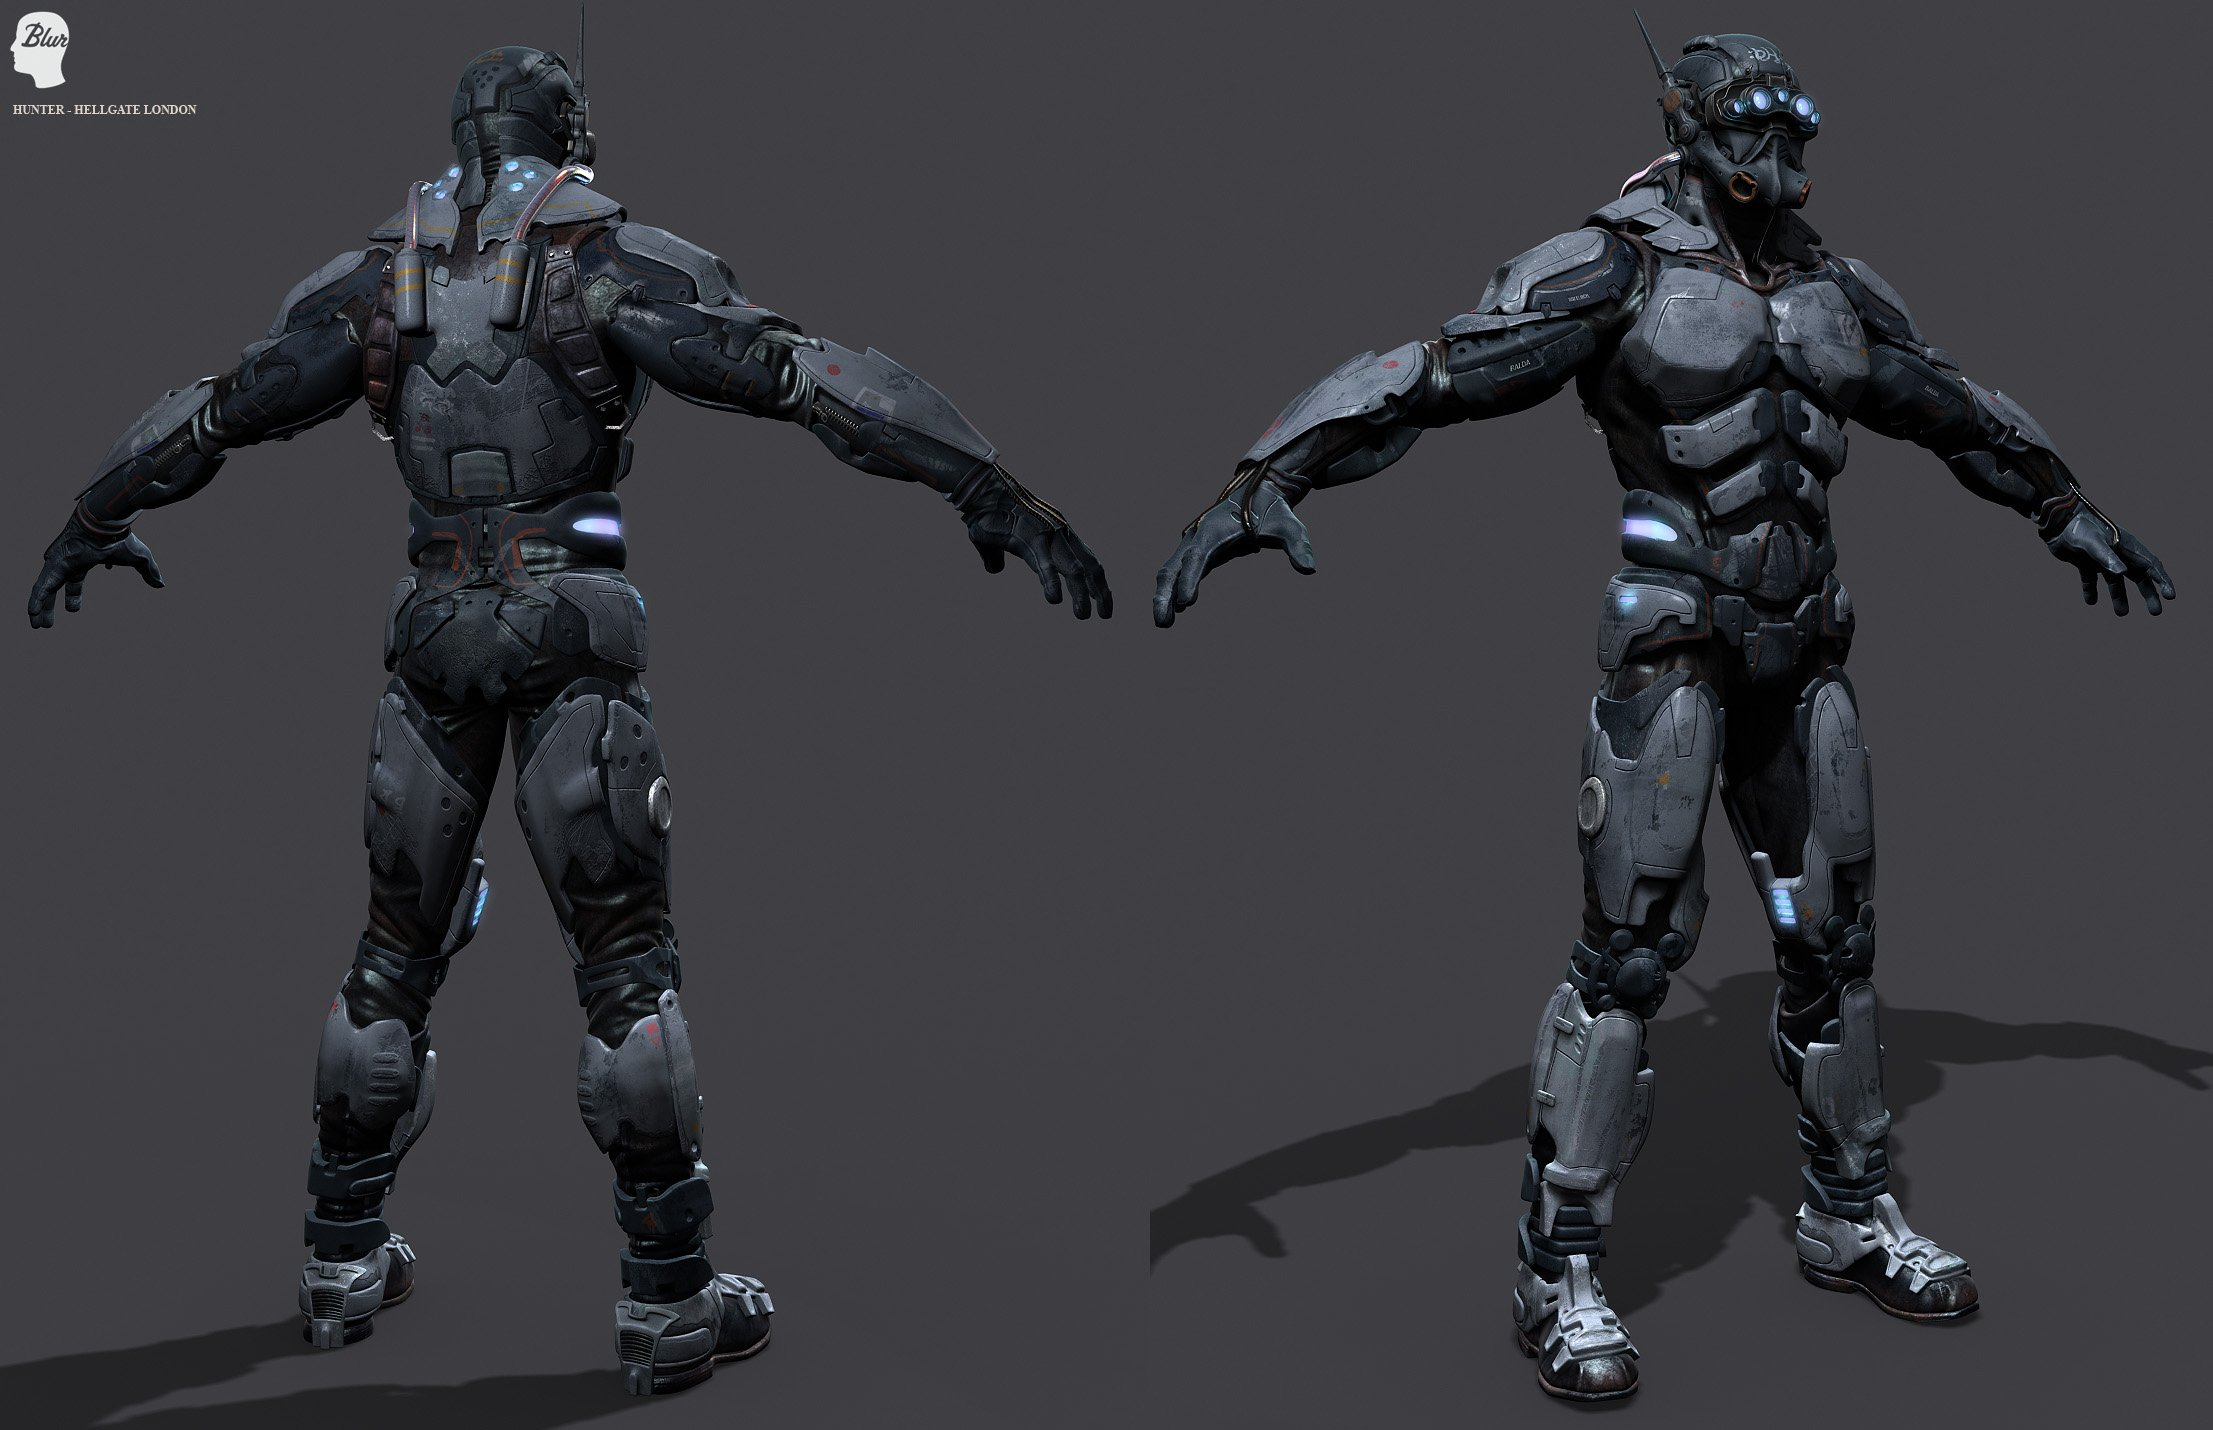 Hellgate London Fantasy Action Sci Fi Warrior Armor Wallpaper